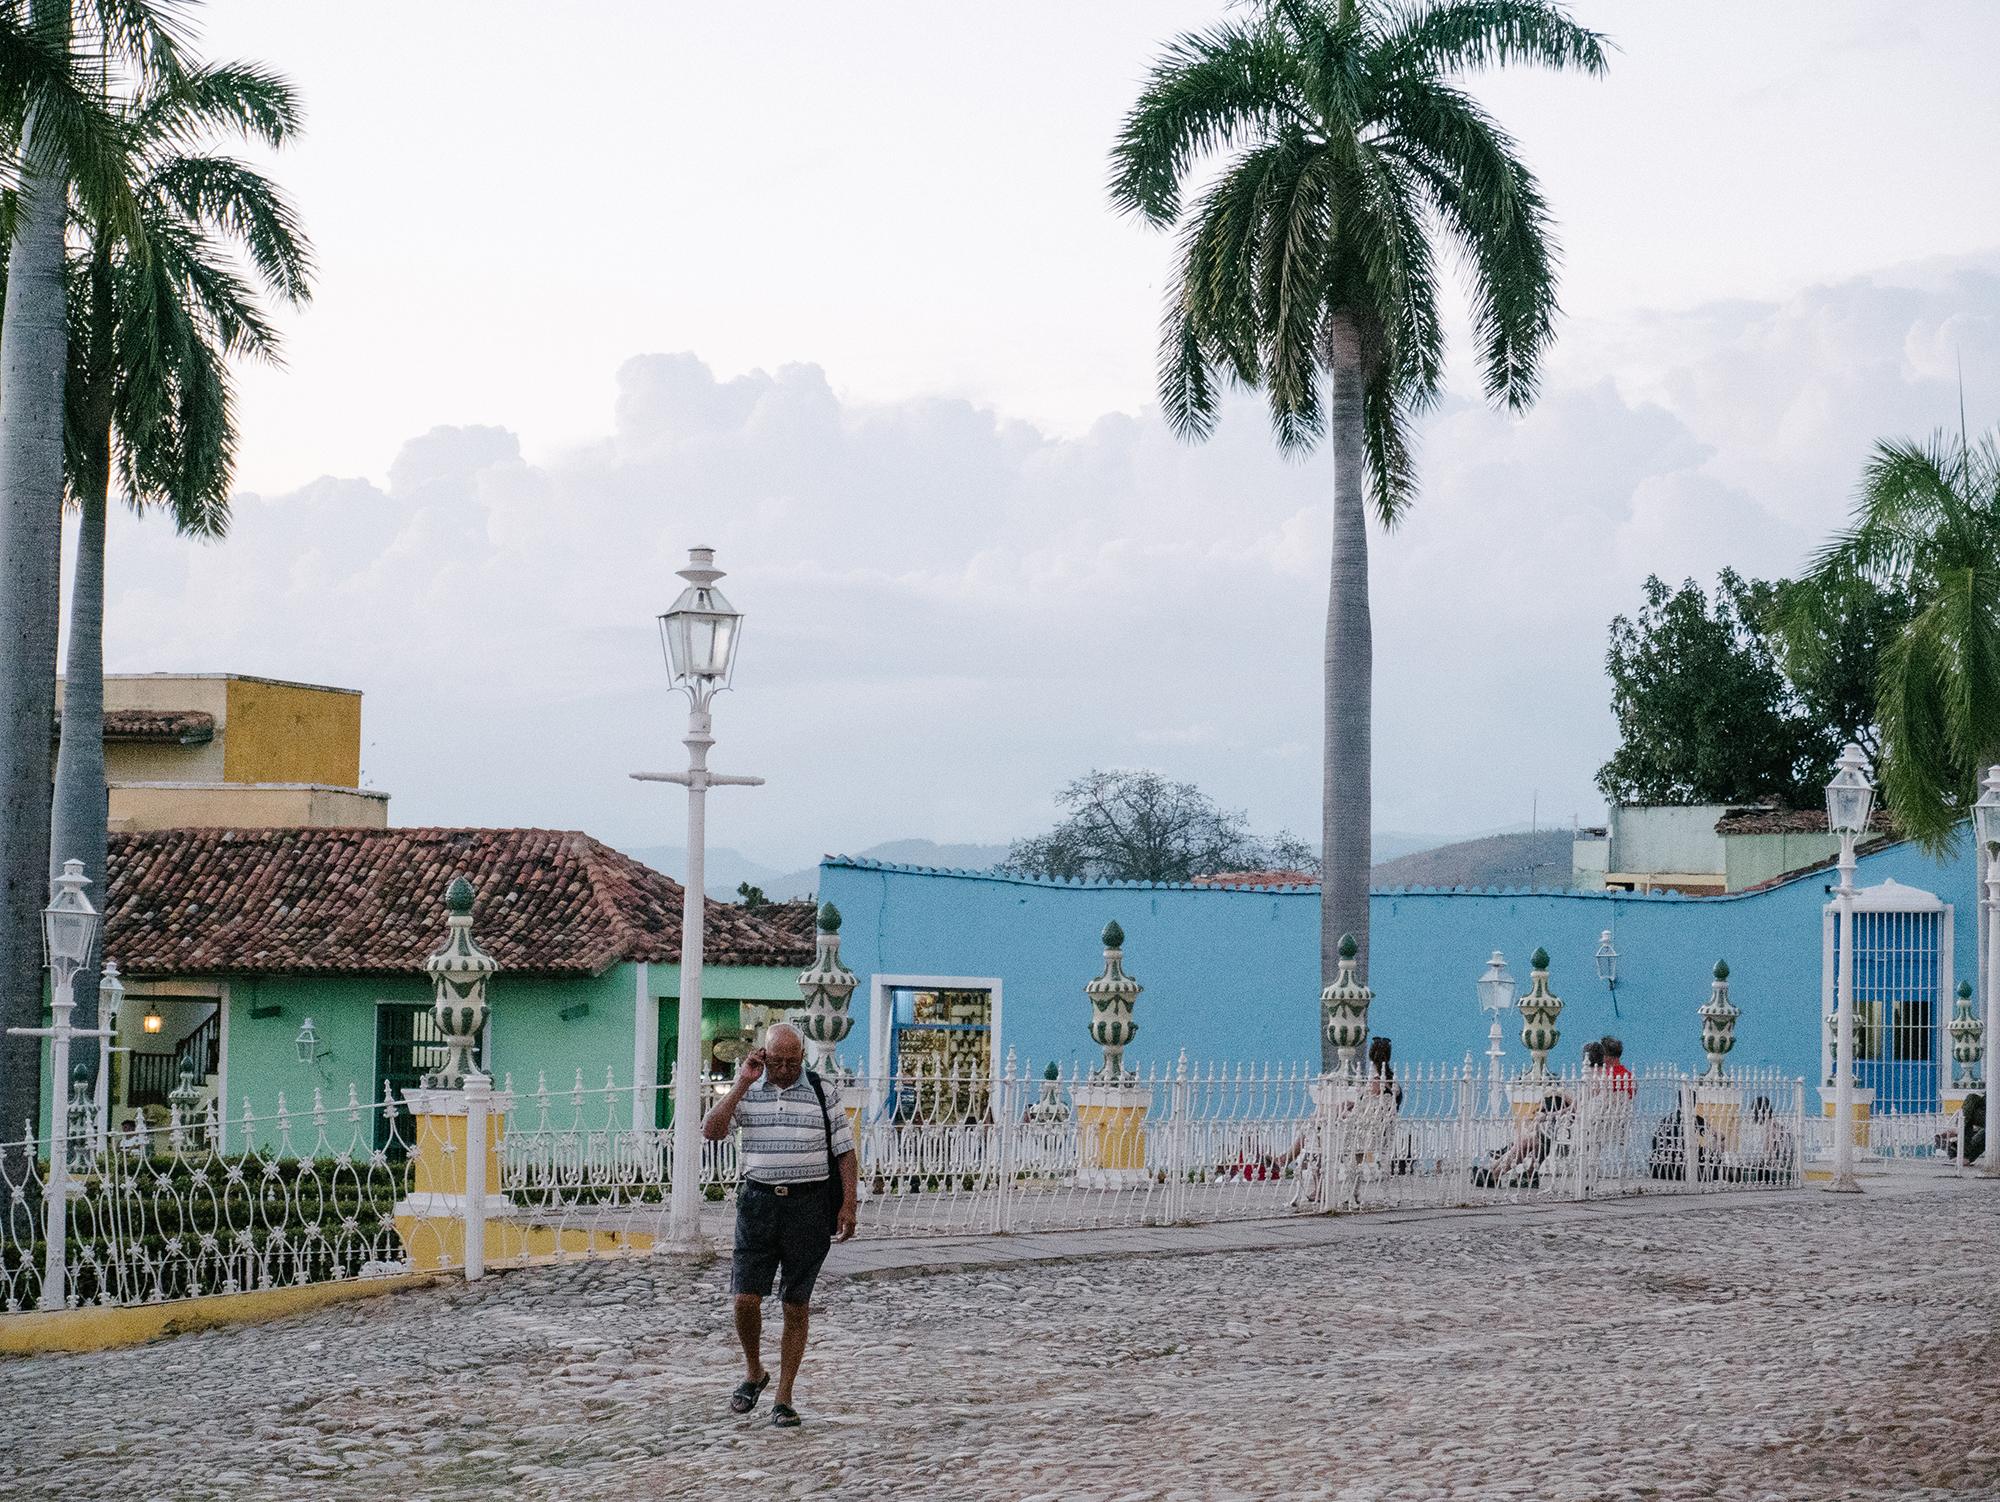 plaza-mayor-trinidad-cuba-unesco-site-authentic-adventure.jpg